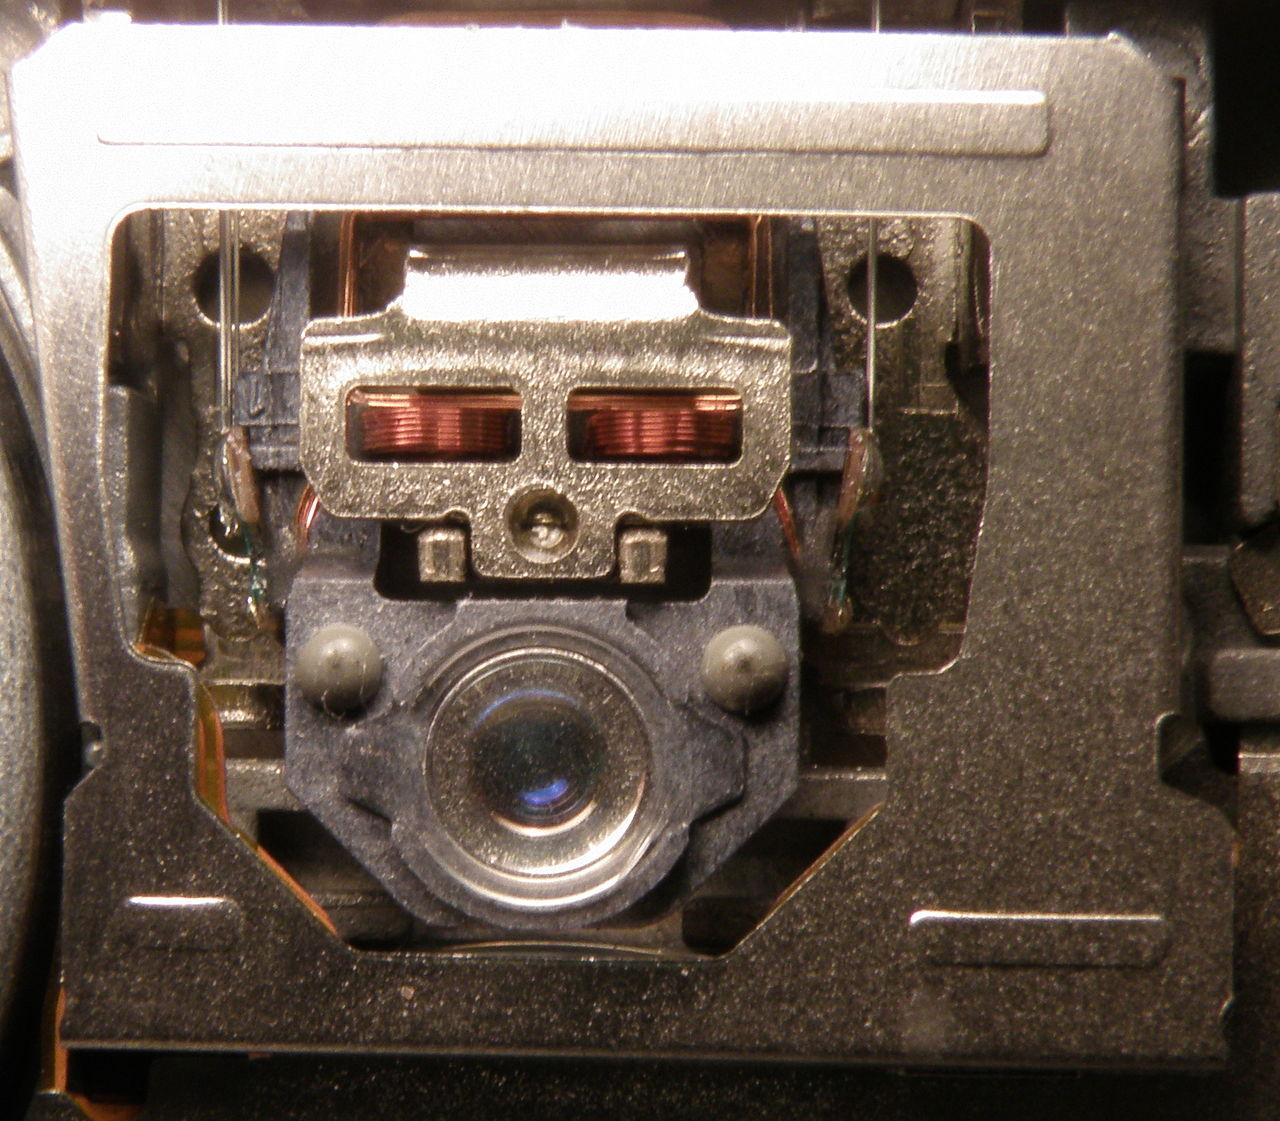 1280px-Optical_drive_lens.JPG